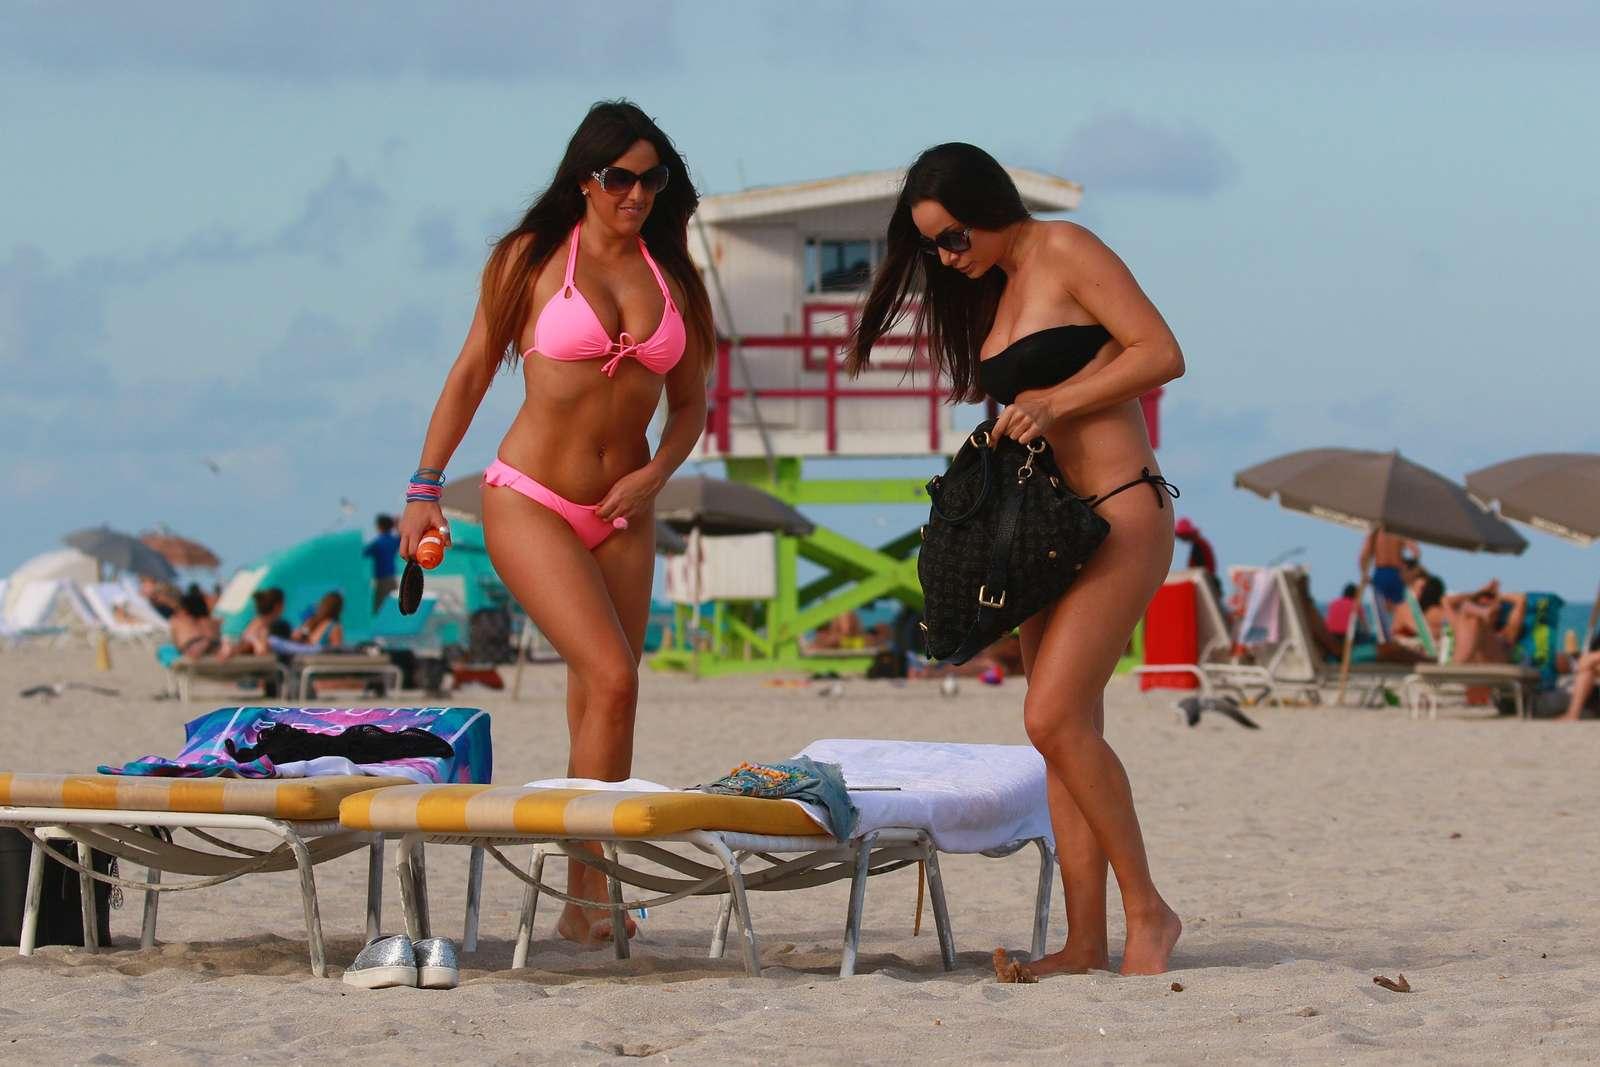 Claudia Romani and Elisa Scheffler in Bikini at the beach in Miami